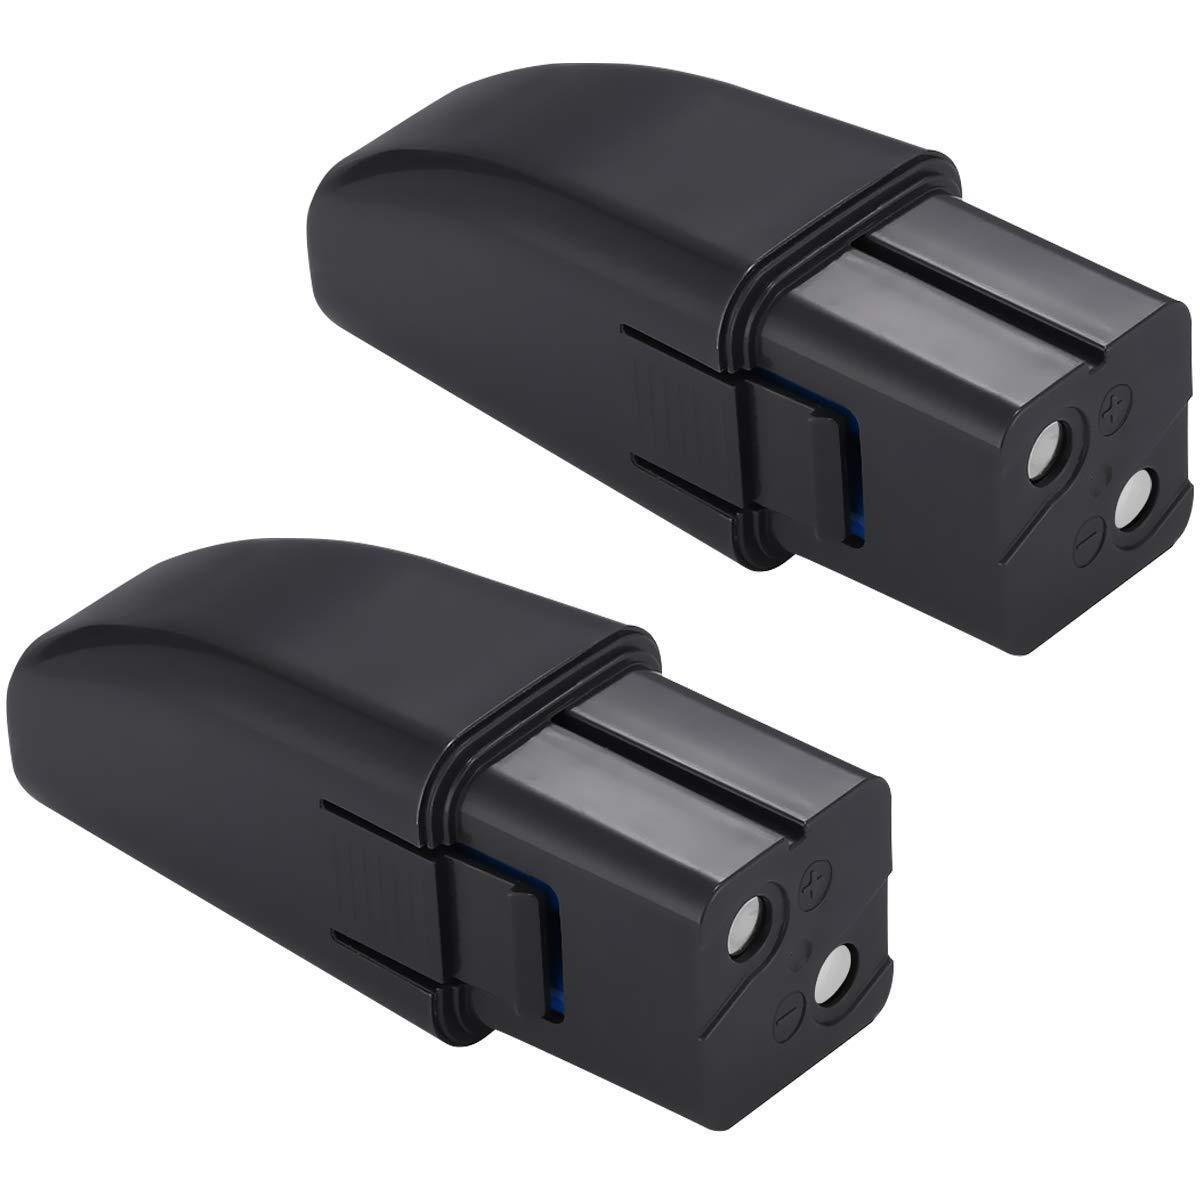 ETSUSA Ontel Swivel Sweeper G1&G2 Battery Replacemet Compatible with Ontel Swivel Sweeper G1 Ontel Swivel Sweeper G2 RU-RBG Vacuum Cleaner (Upgraded 2000mAh)